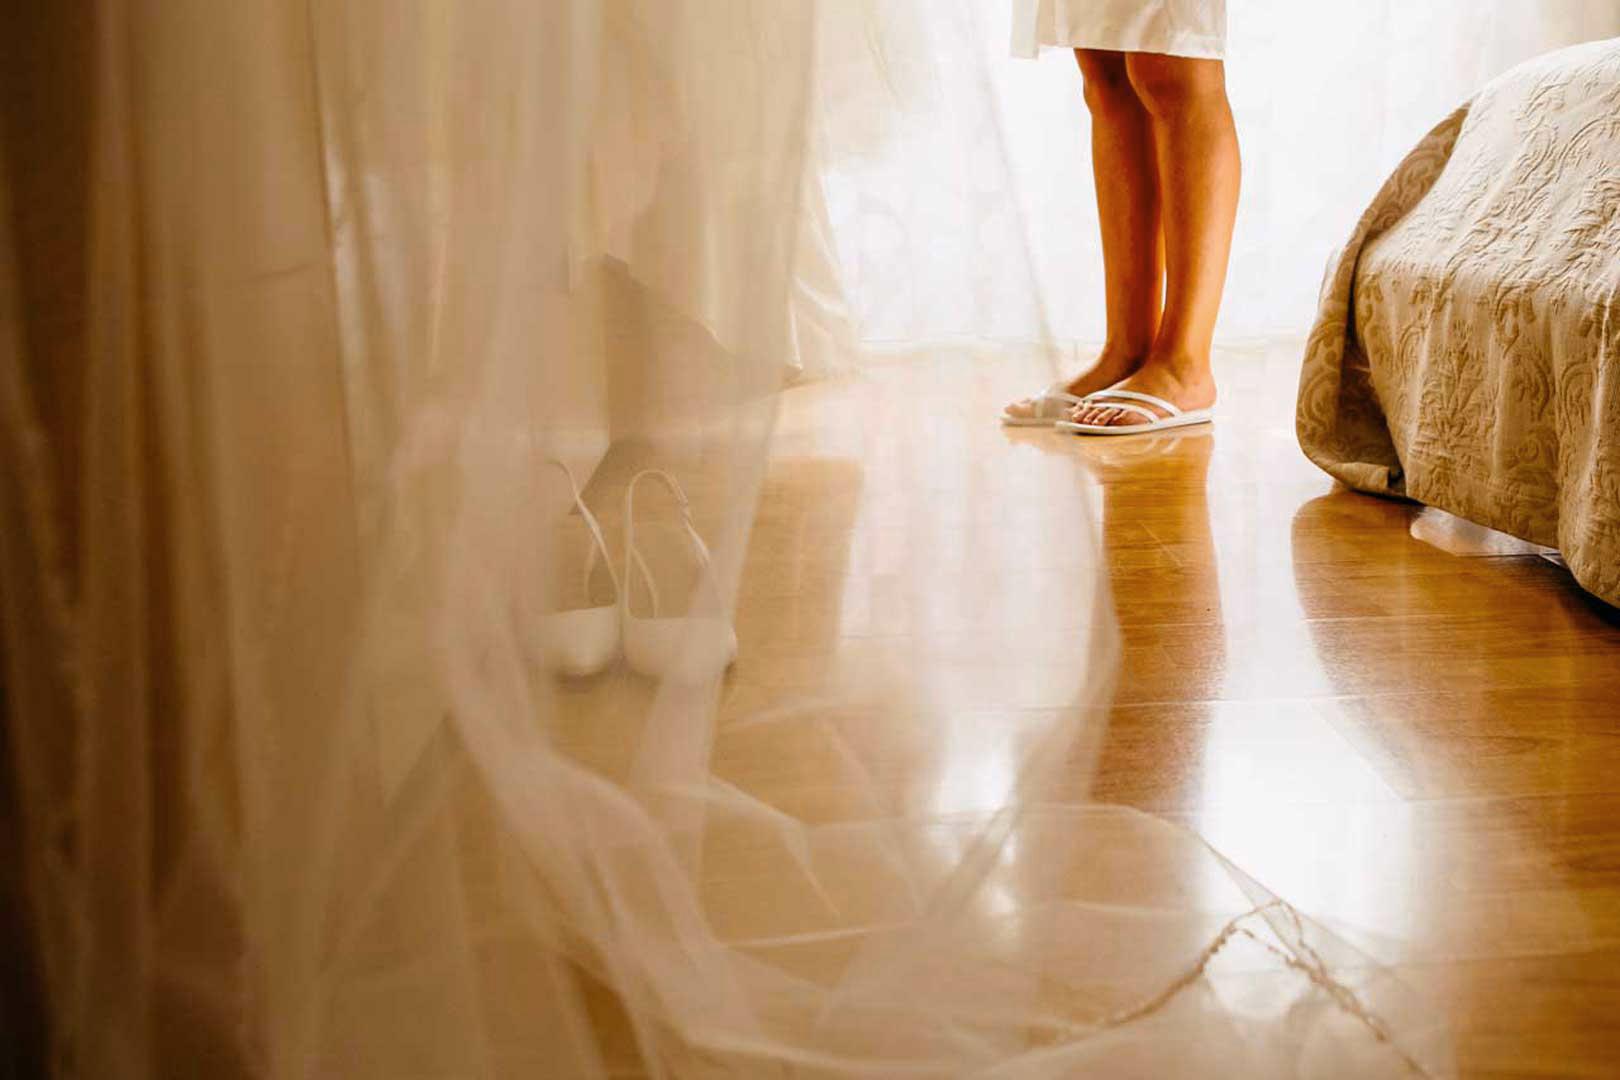 007-dettagli-sposa-gianni-lepore-wedding-photographer